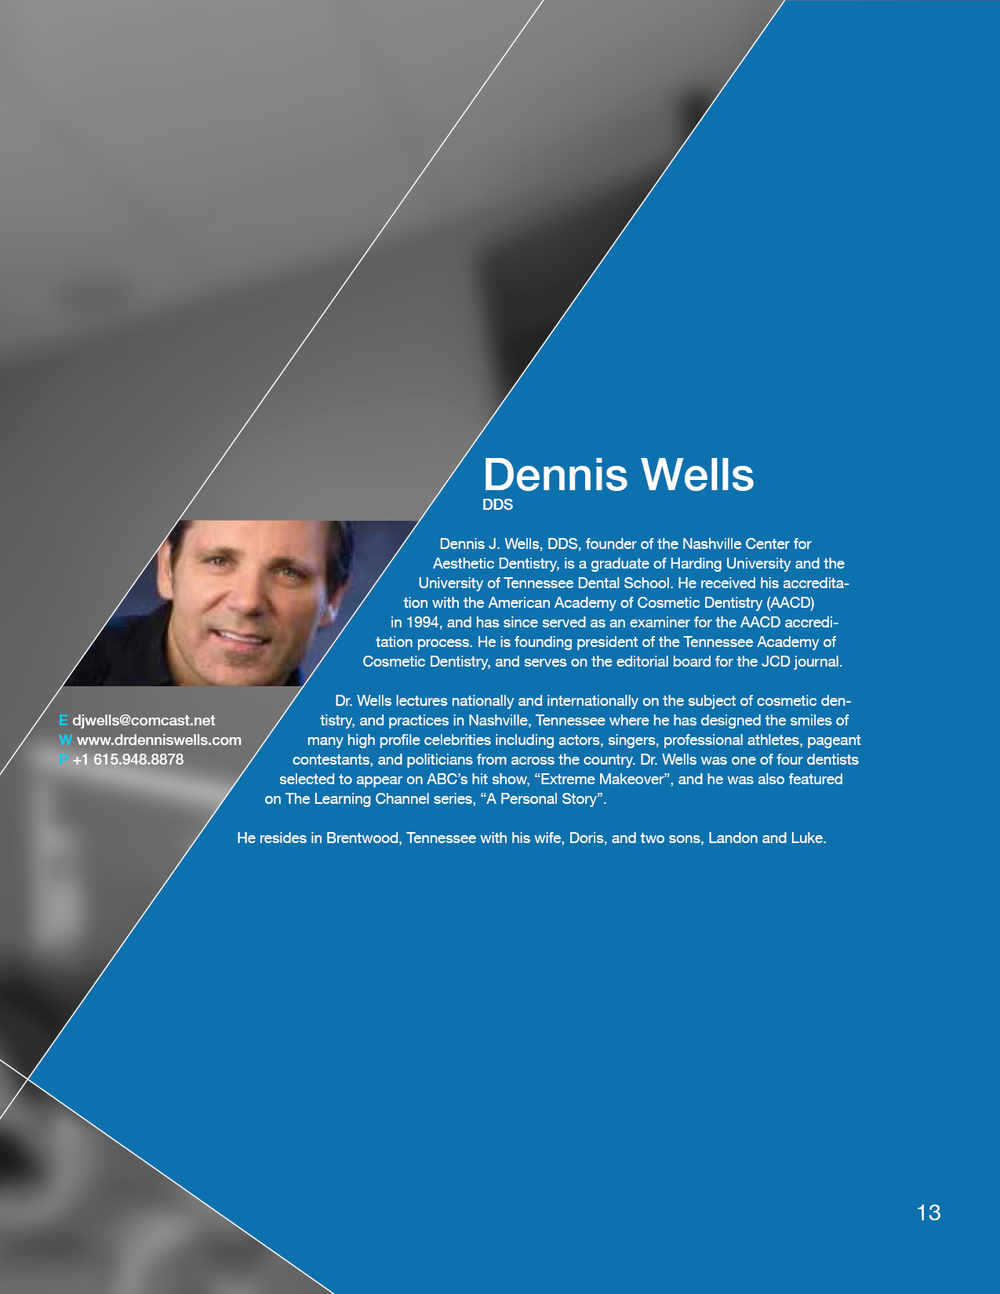 Dental Ed Brochure 2014_1_1513.png